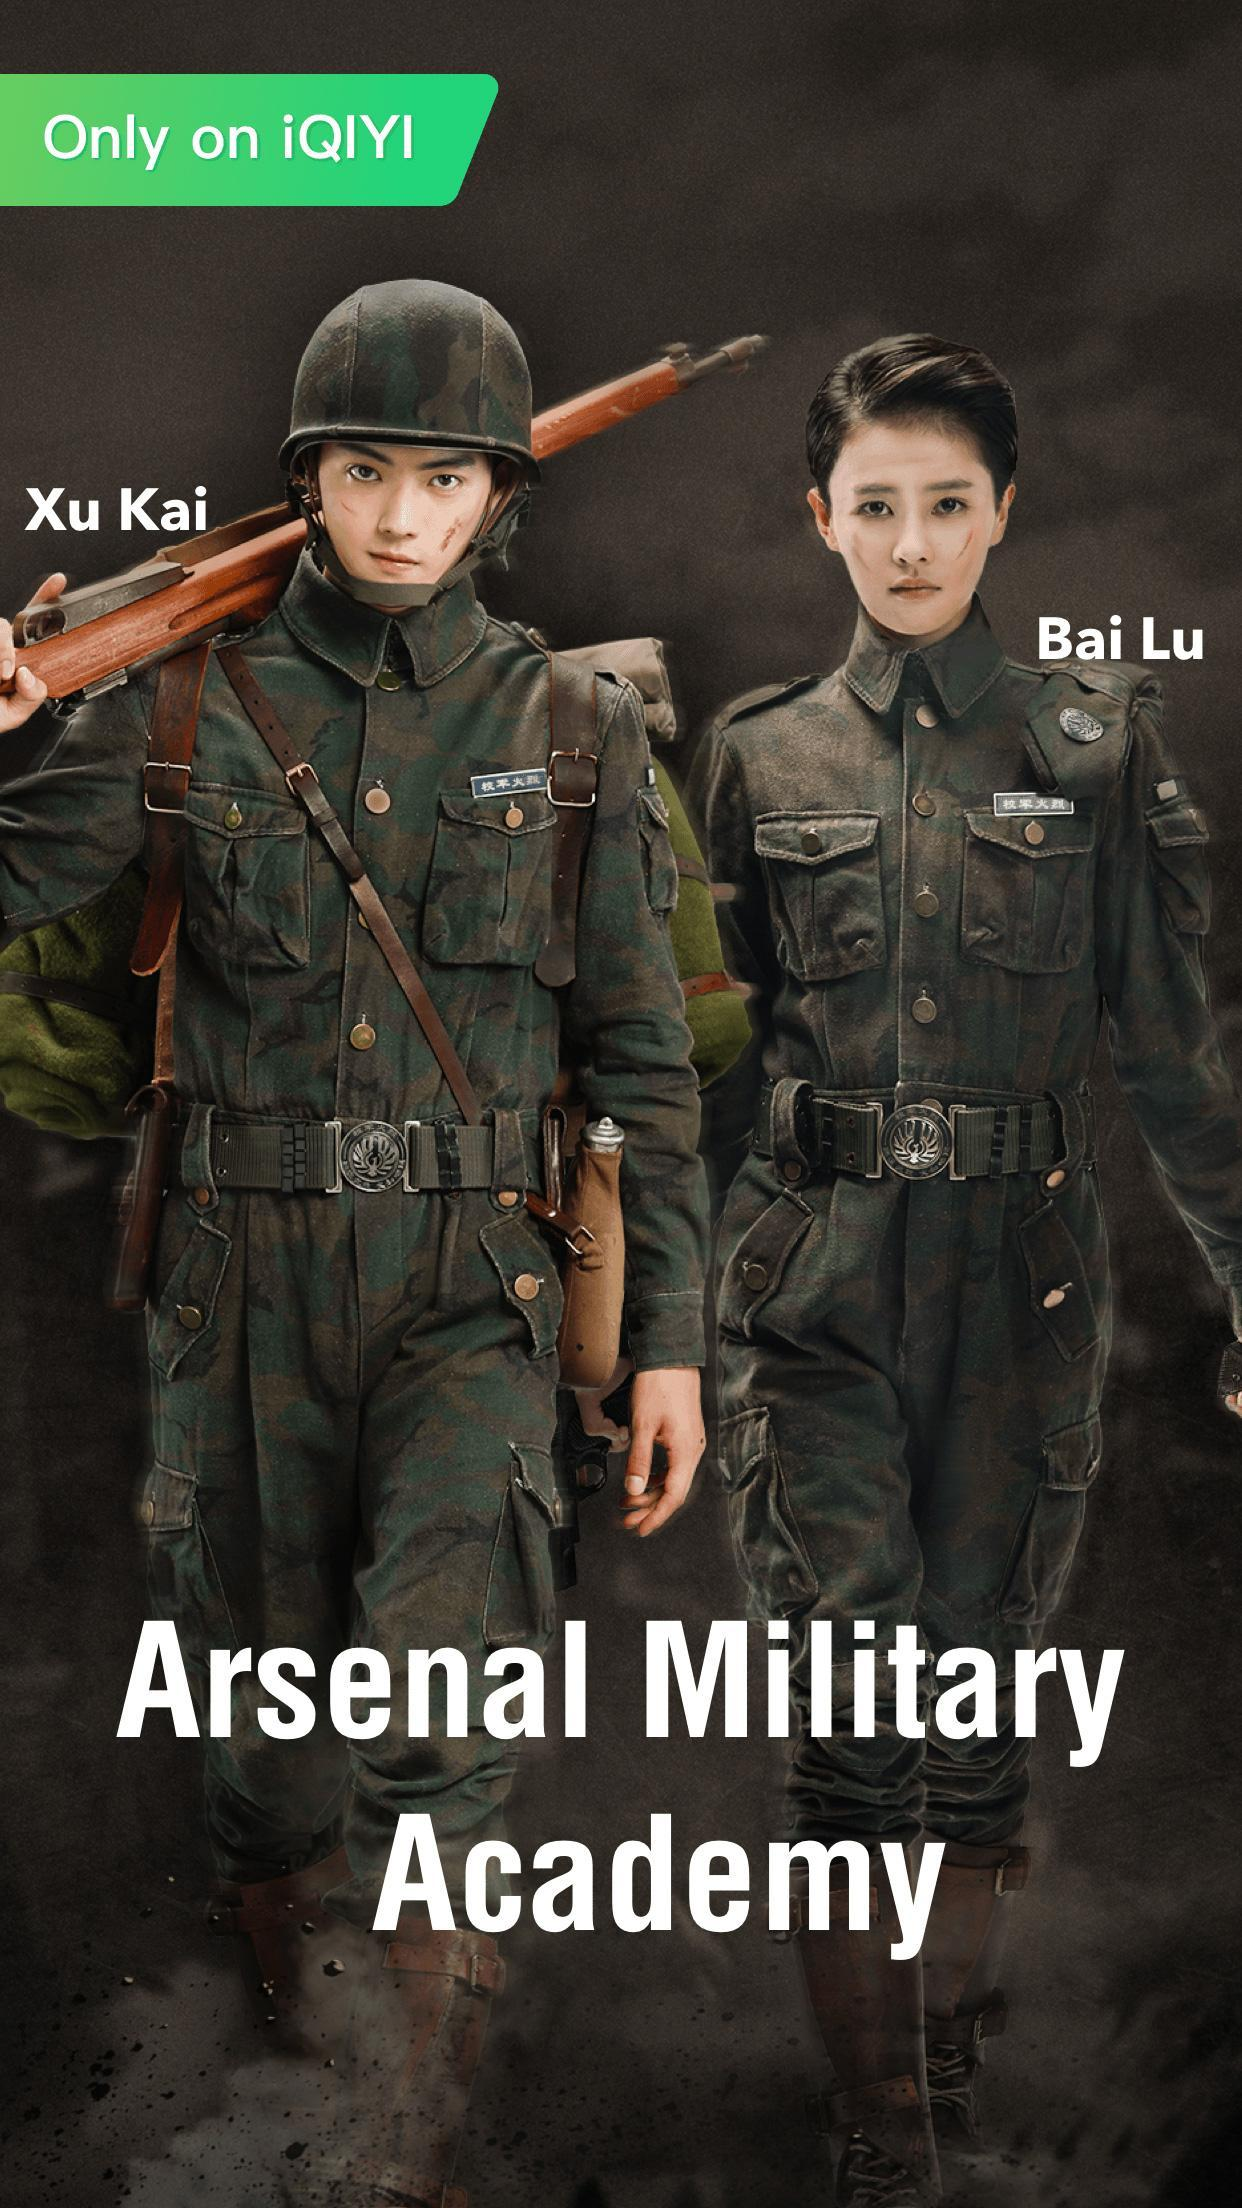 Arsenal Military Academy C Drama Mini Review honeycrunch321 1242x2208